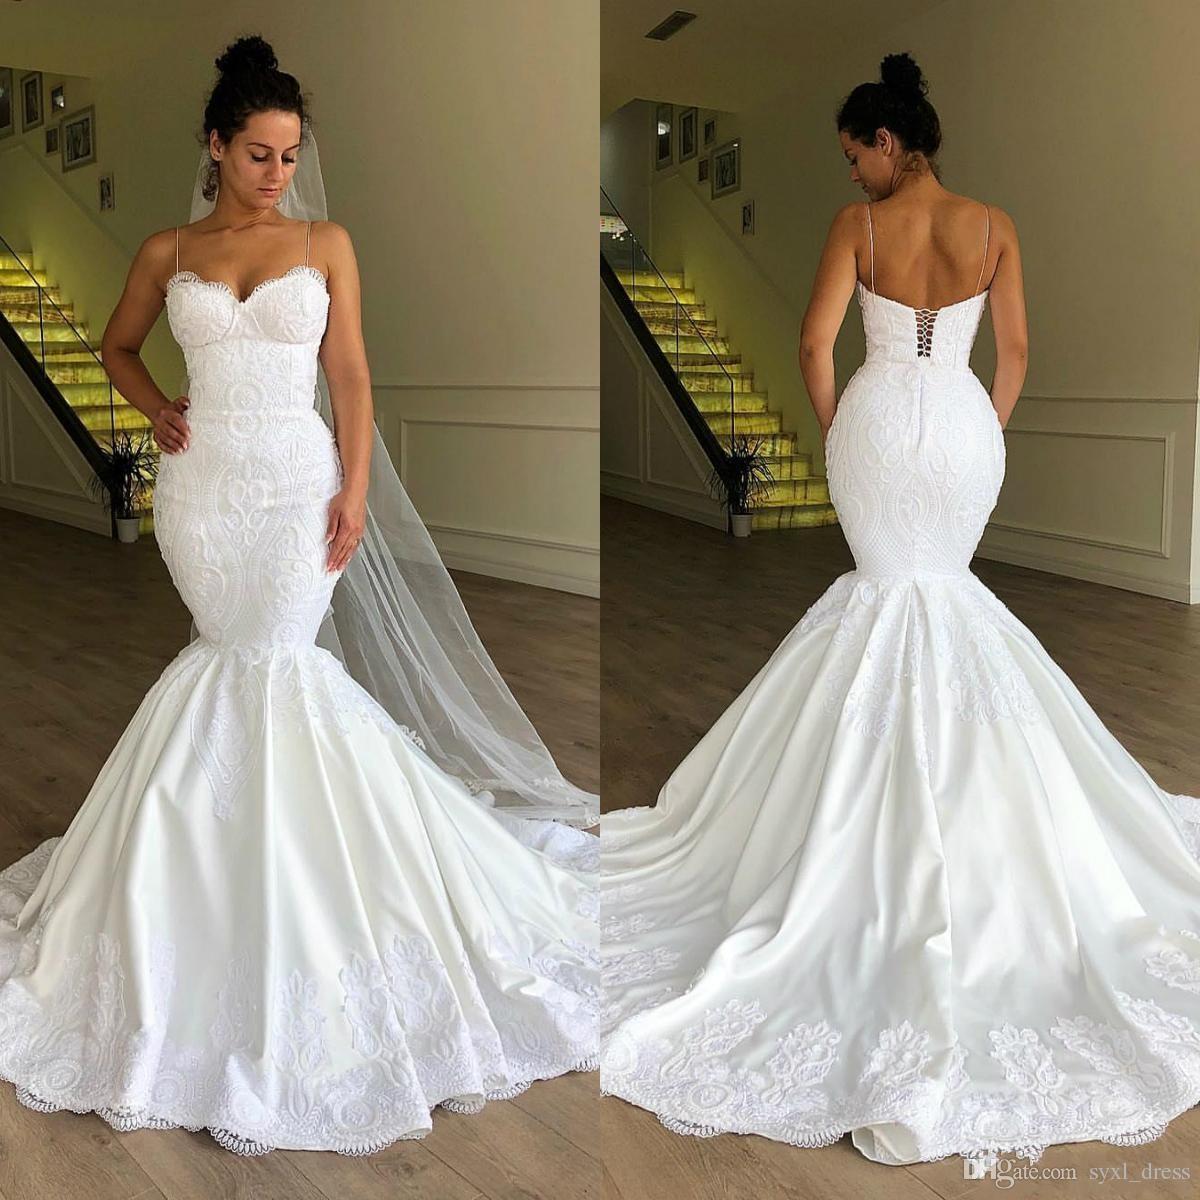 d14118fa44616 2019 South African Plus Size Mermaid Wedding Dresses Bridal Gowns Vestido De  Noiva Robe De Mariée Spaghetti Neck Lace Up Chiffon Wedding Dresses Designer  ...